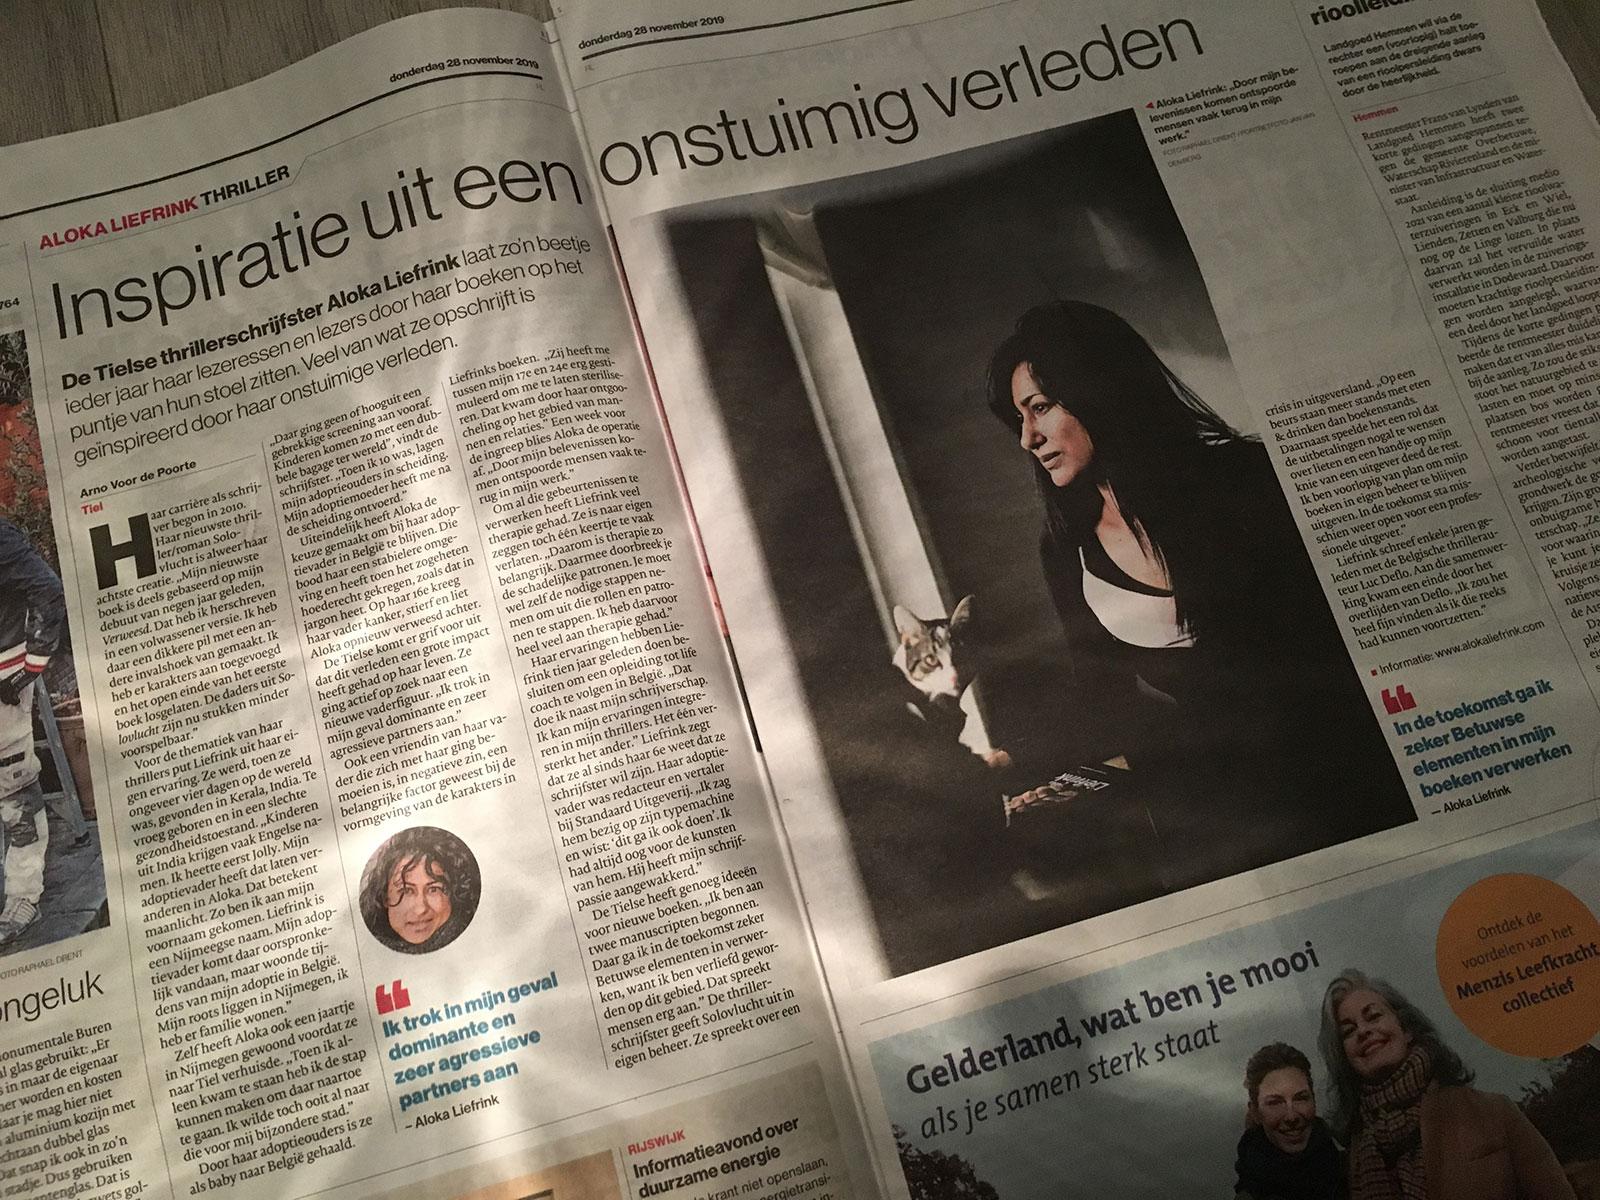 gelderlander artikel Aloka Liefrink 28 nov 2019